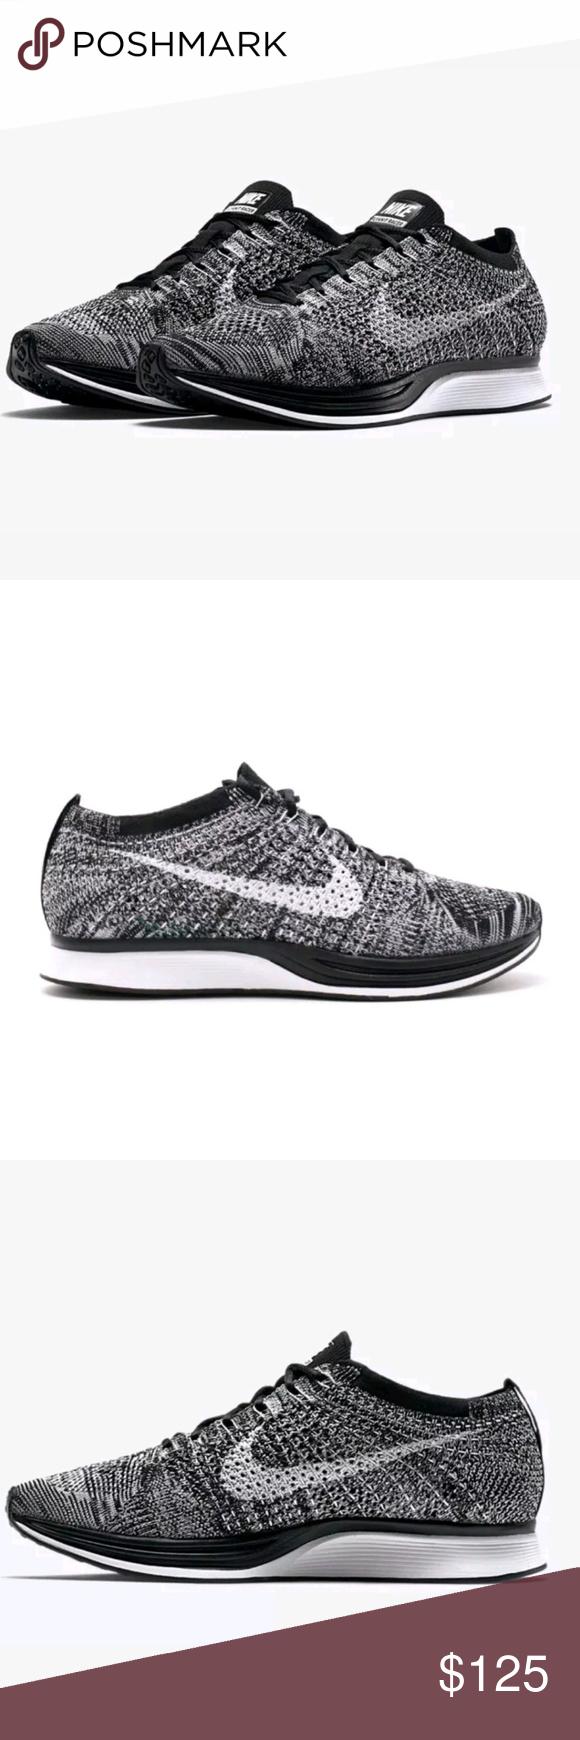 d6e3dc64 NIKE FLYKNIT RACER OREO 2.0 BLACK / WHITE Size 11 Brand new dead stock size  11.5 Nike Shoes Sneakers